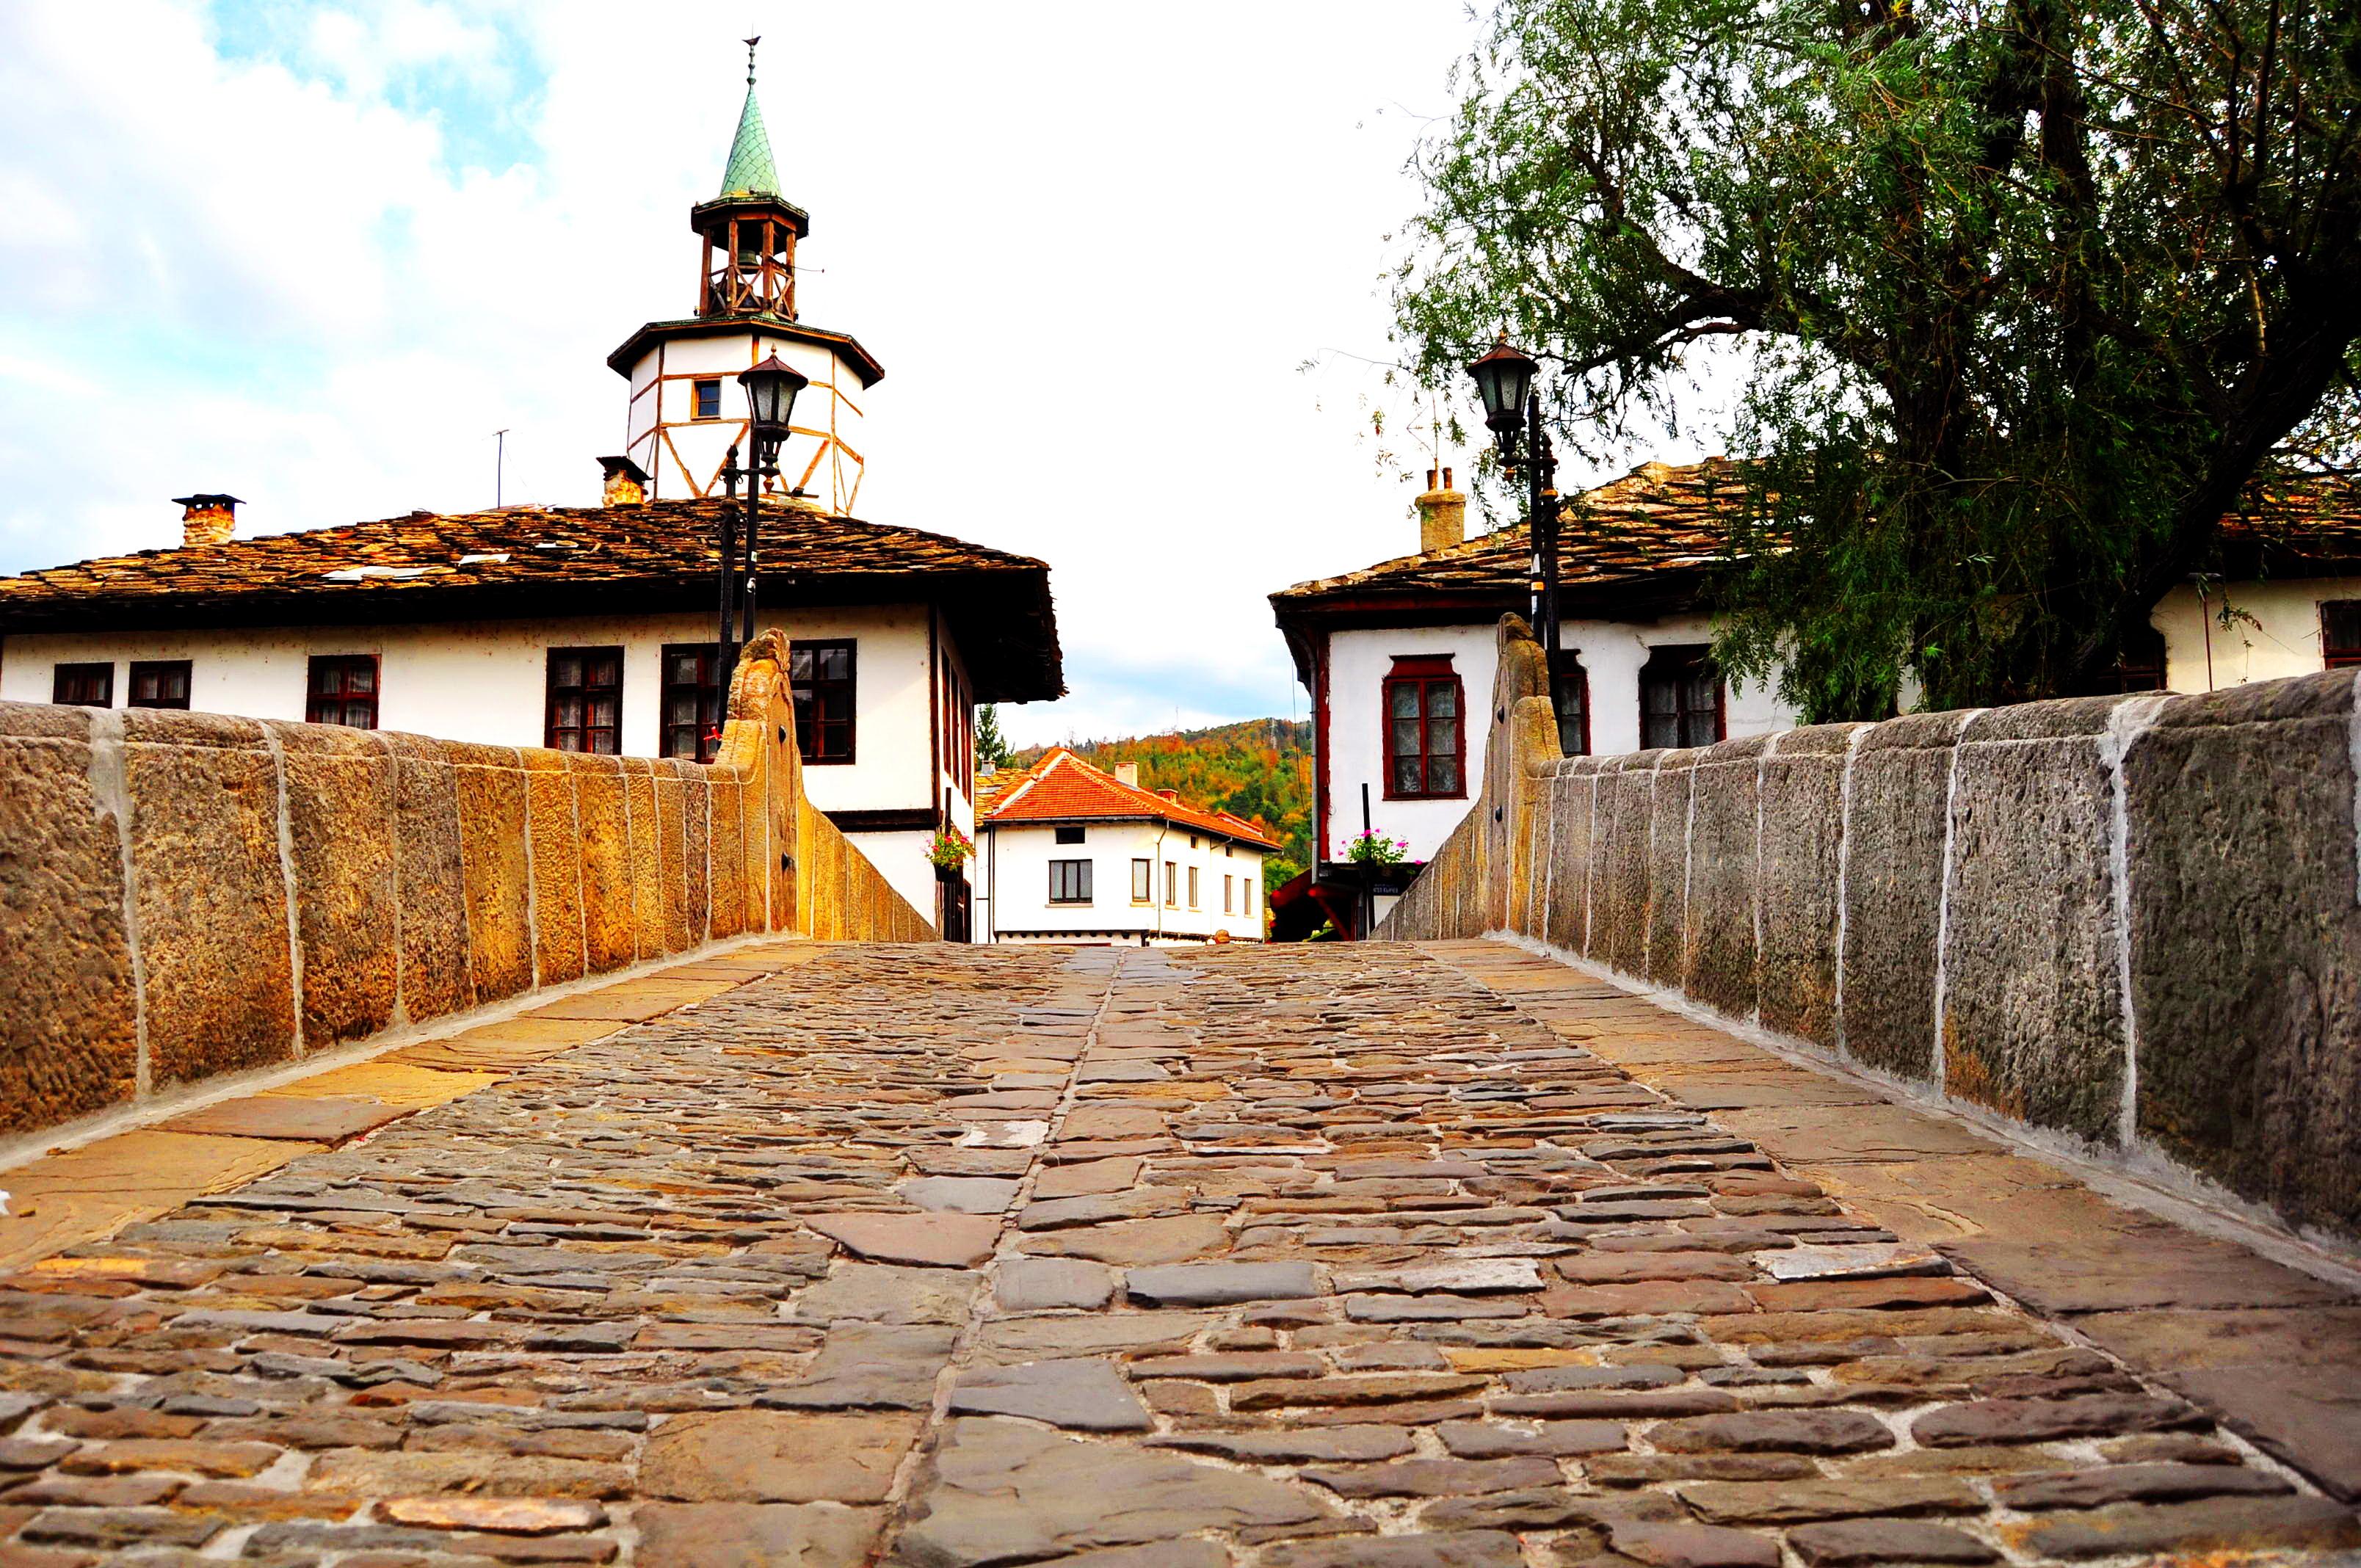 Turnul cu ceas. Tryavna. Bulgaria